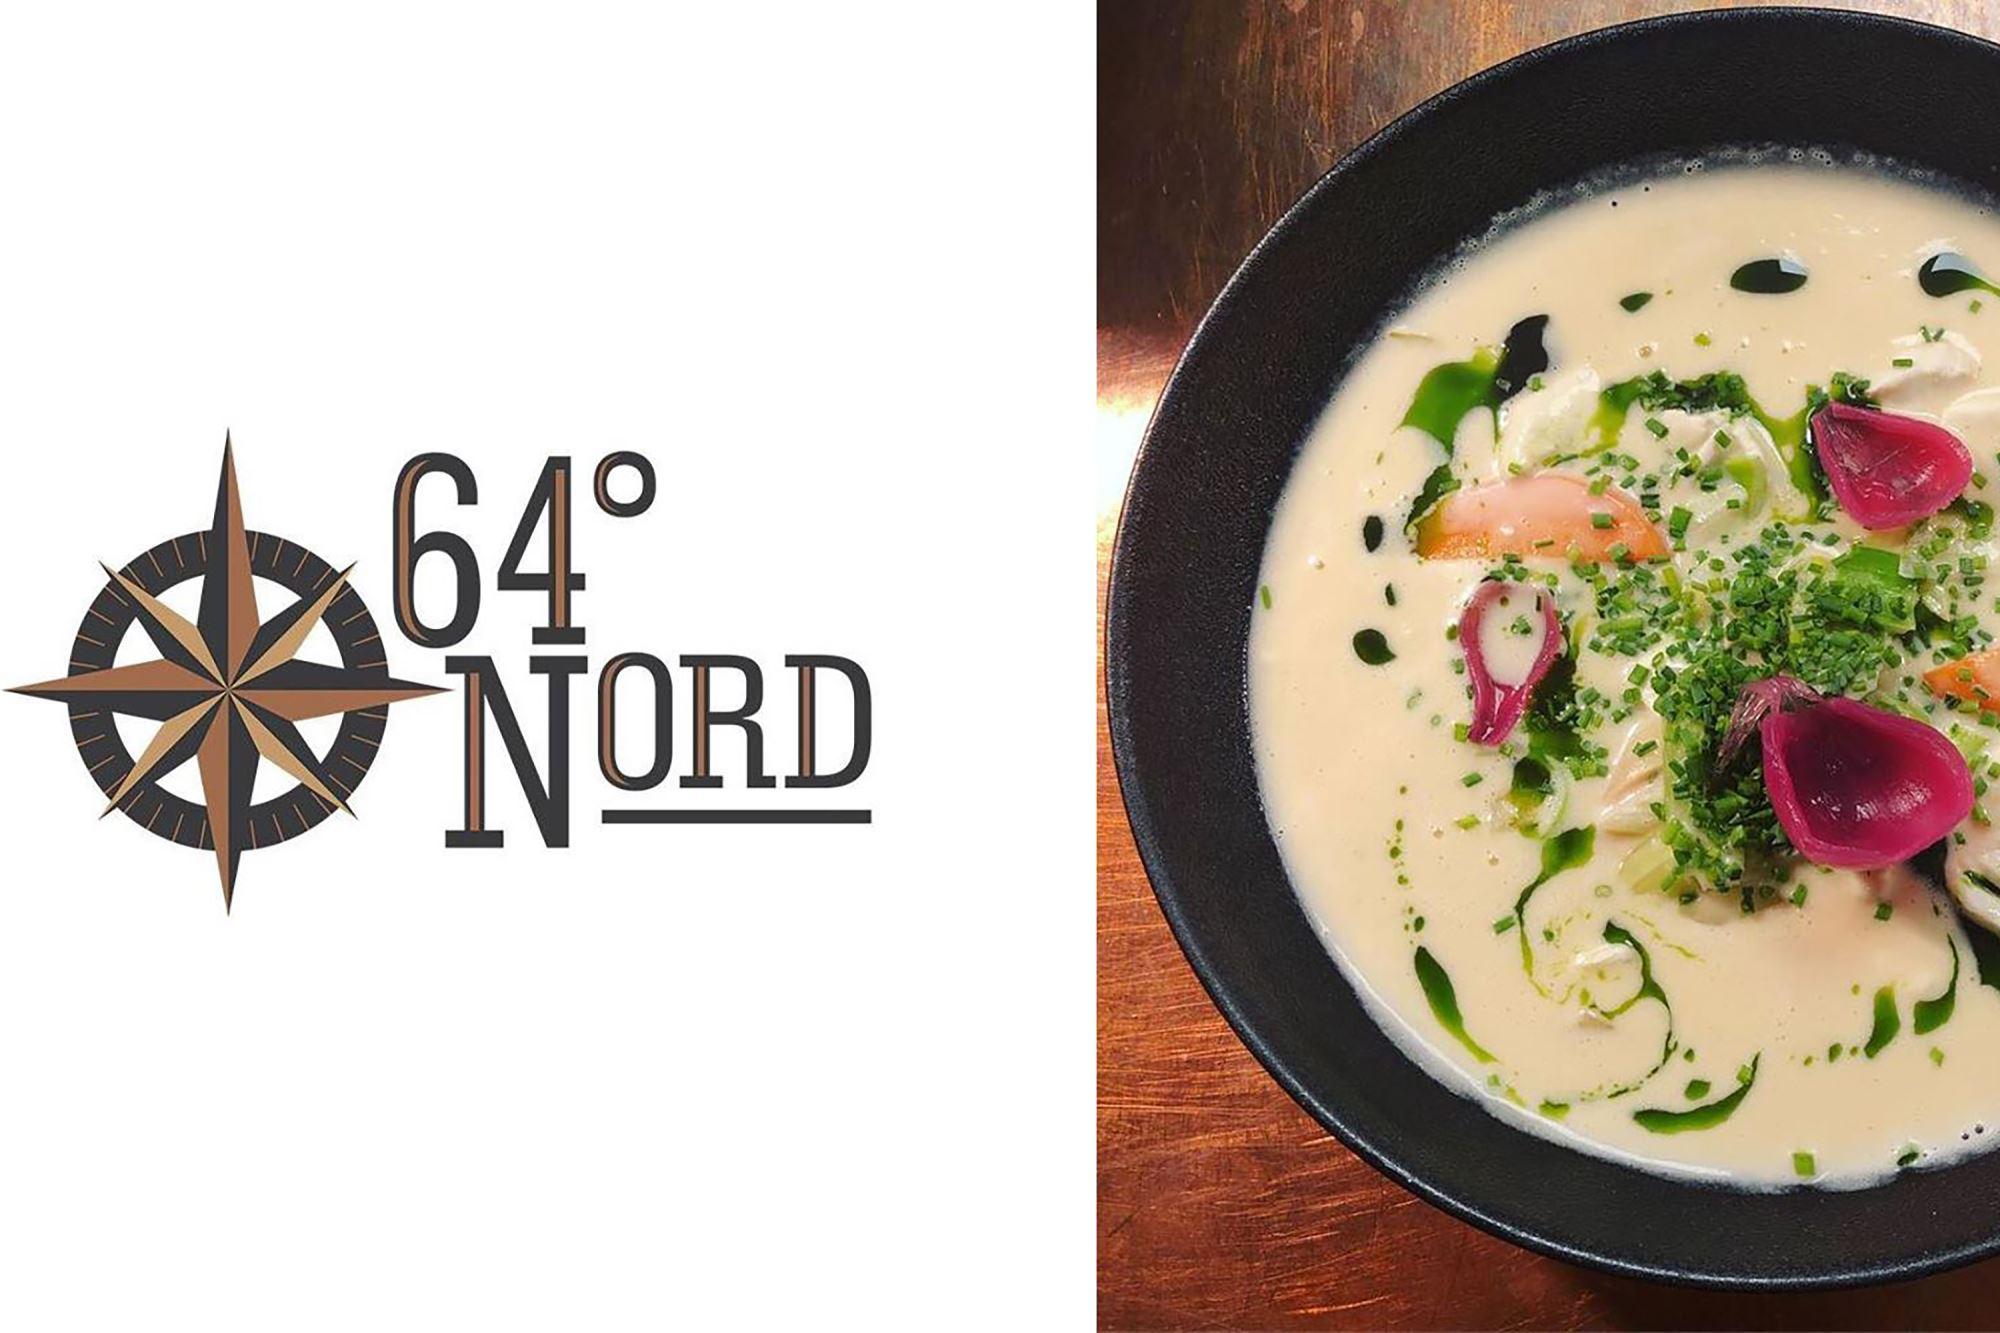 64⁰Nord restaurant